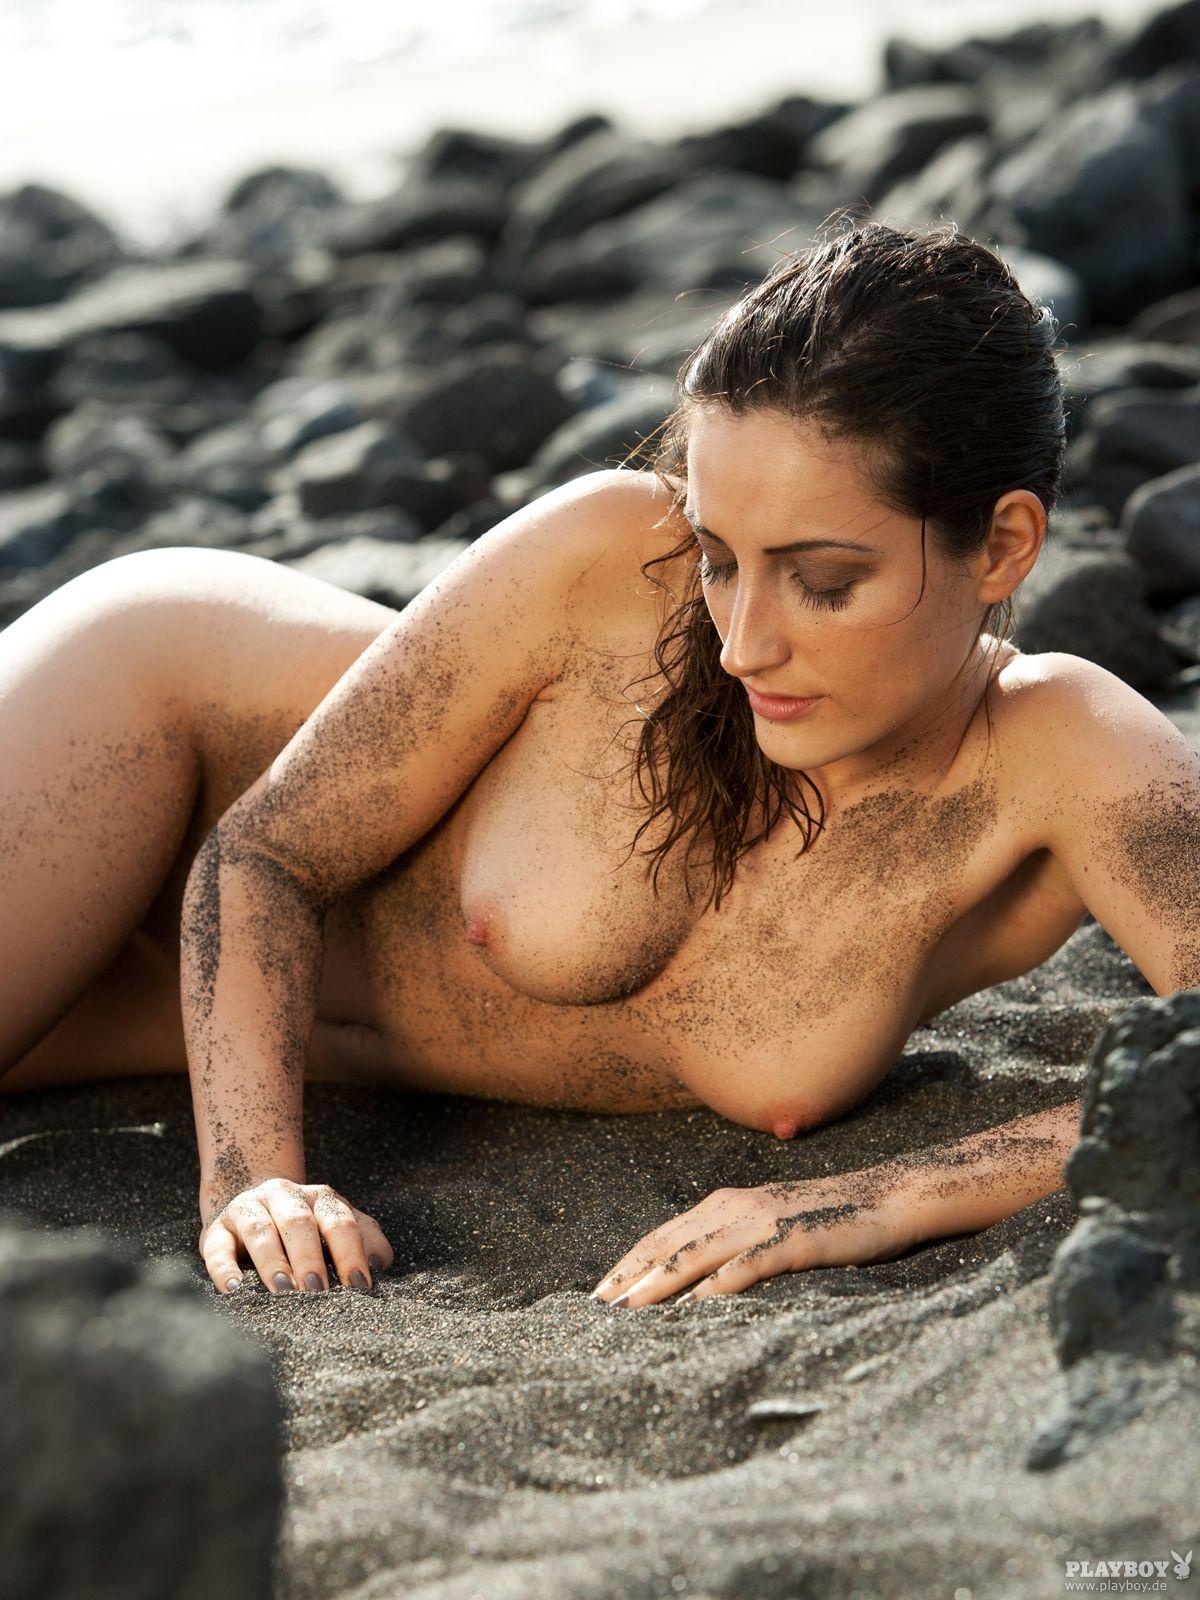 Playboy Hot Women From Turkey Aylin Alp Of Germany  The -5841